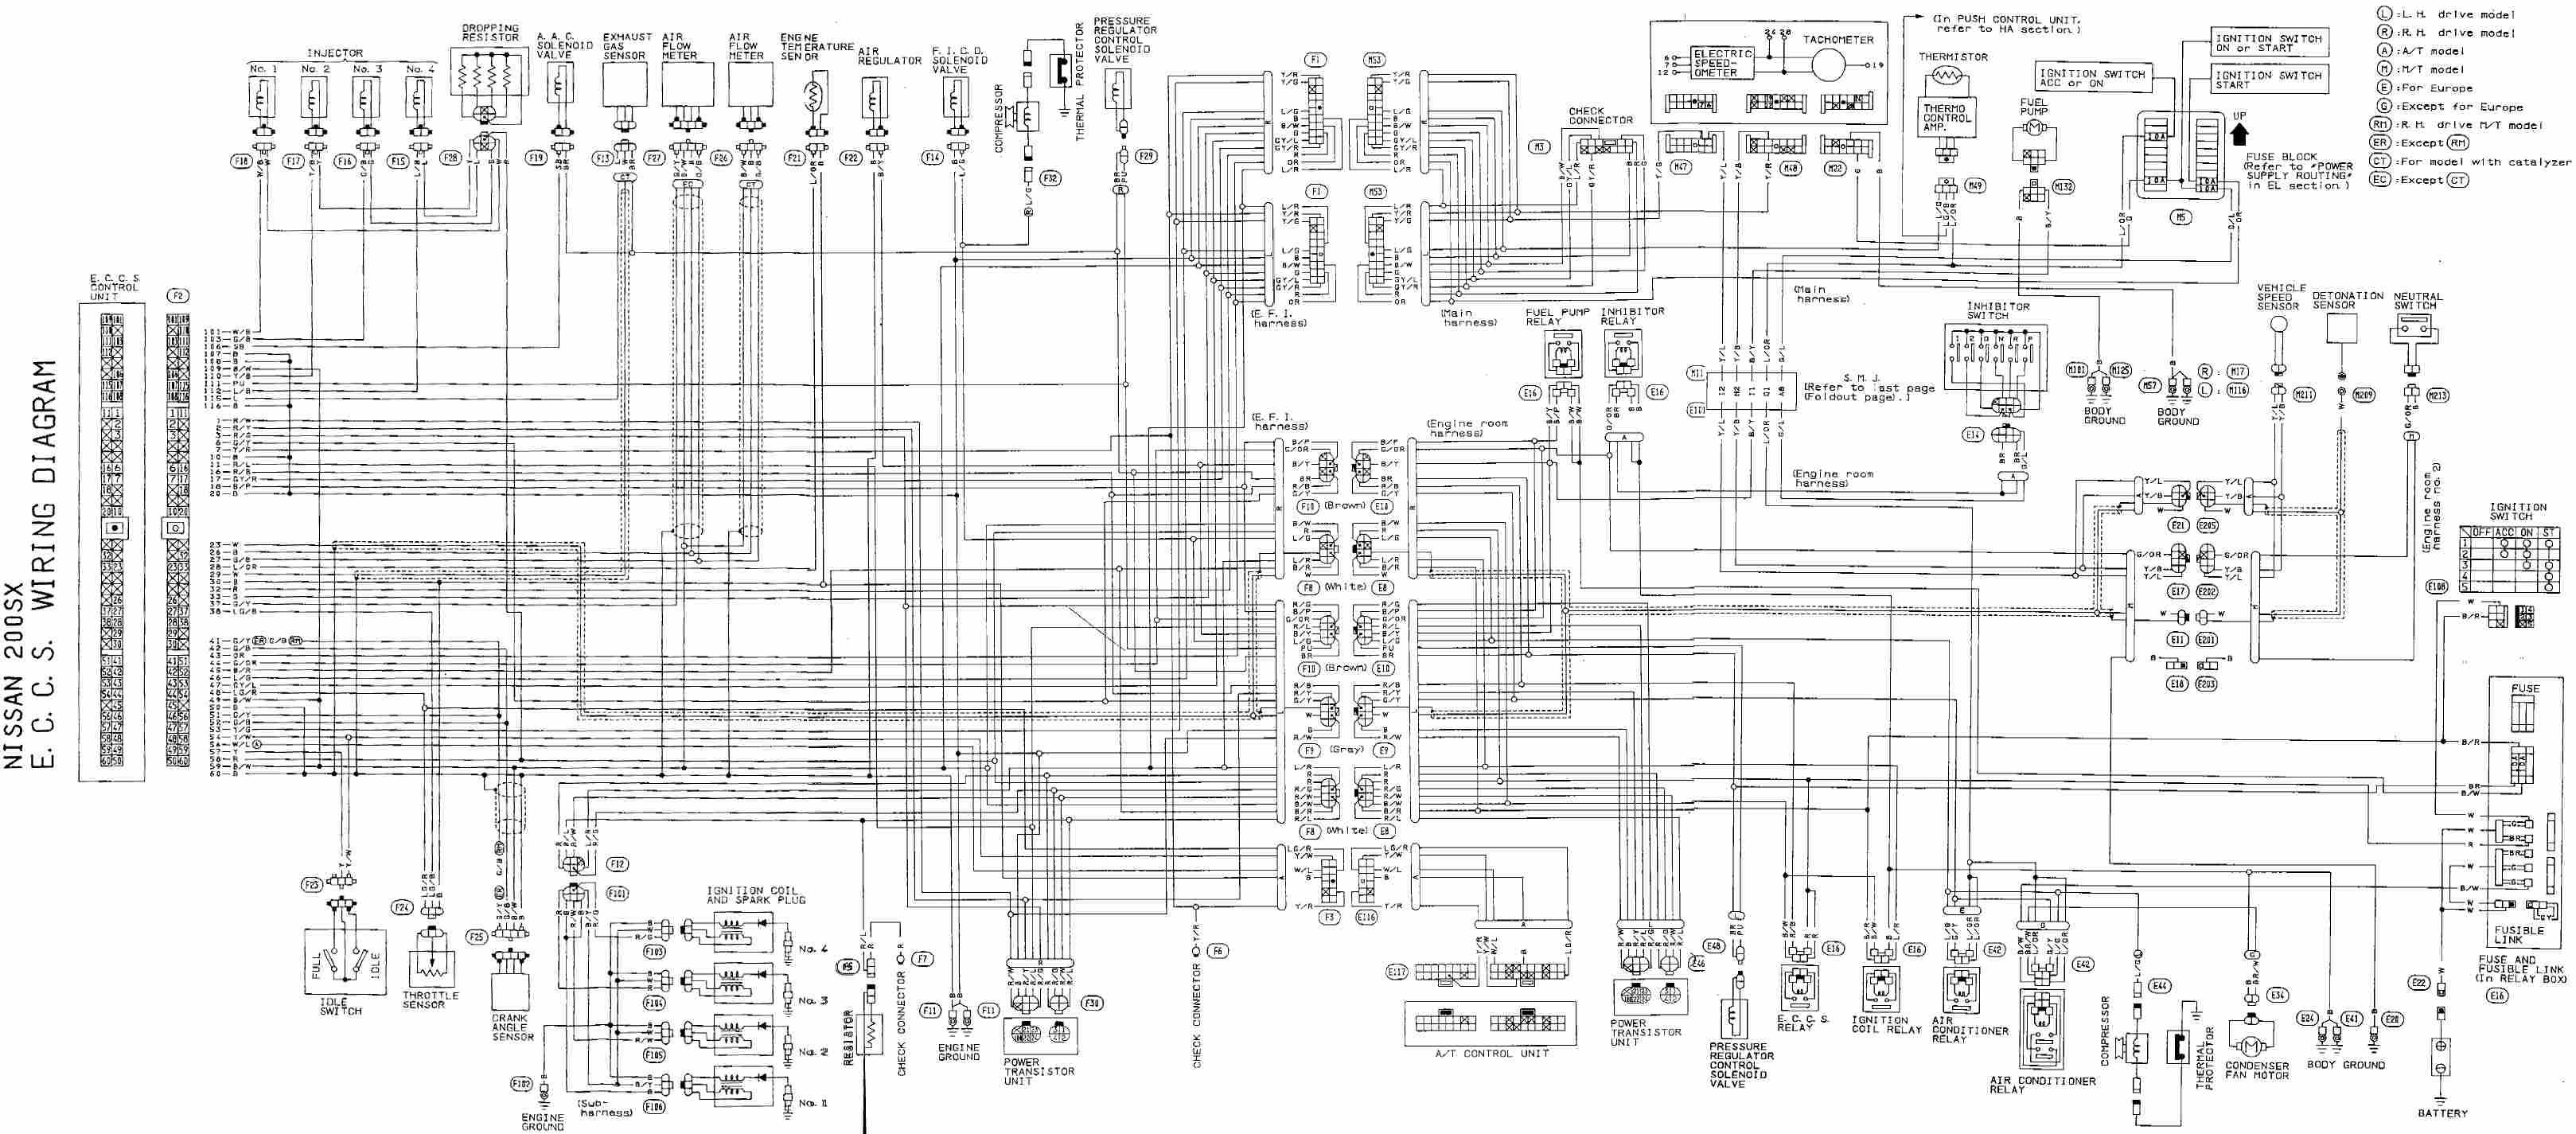 nissan sr20det wiring diagram